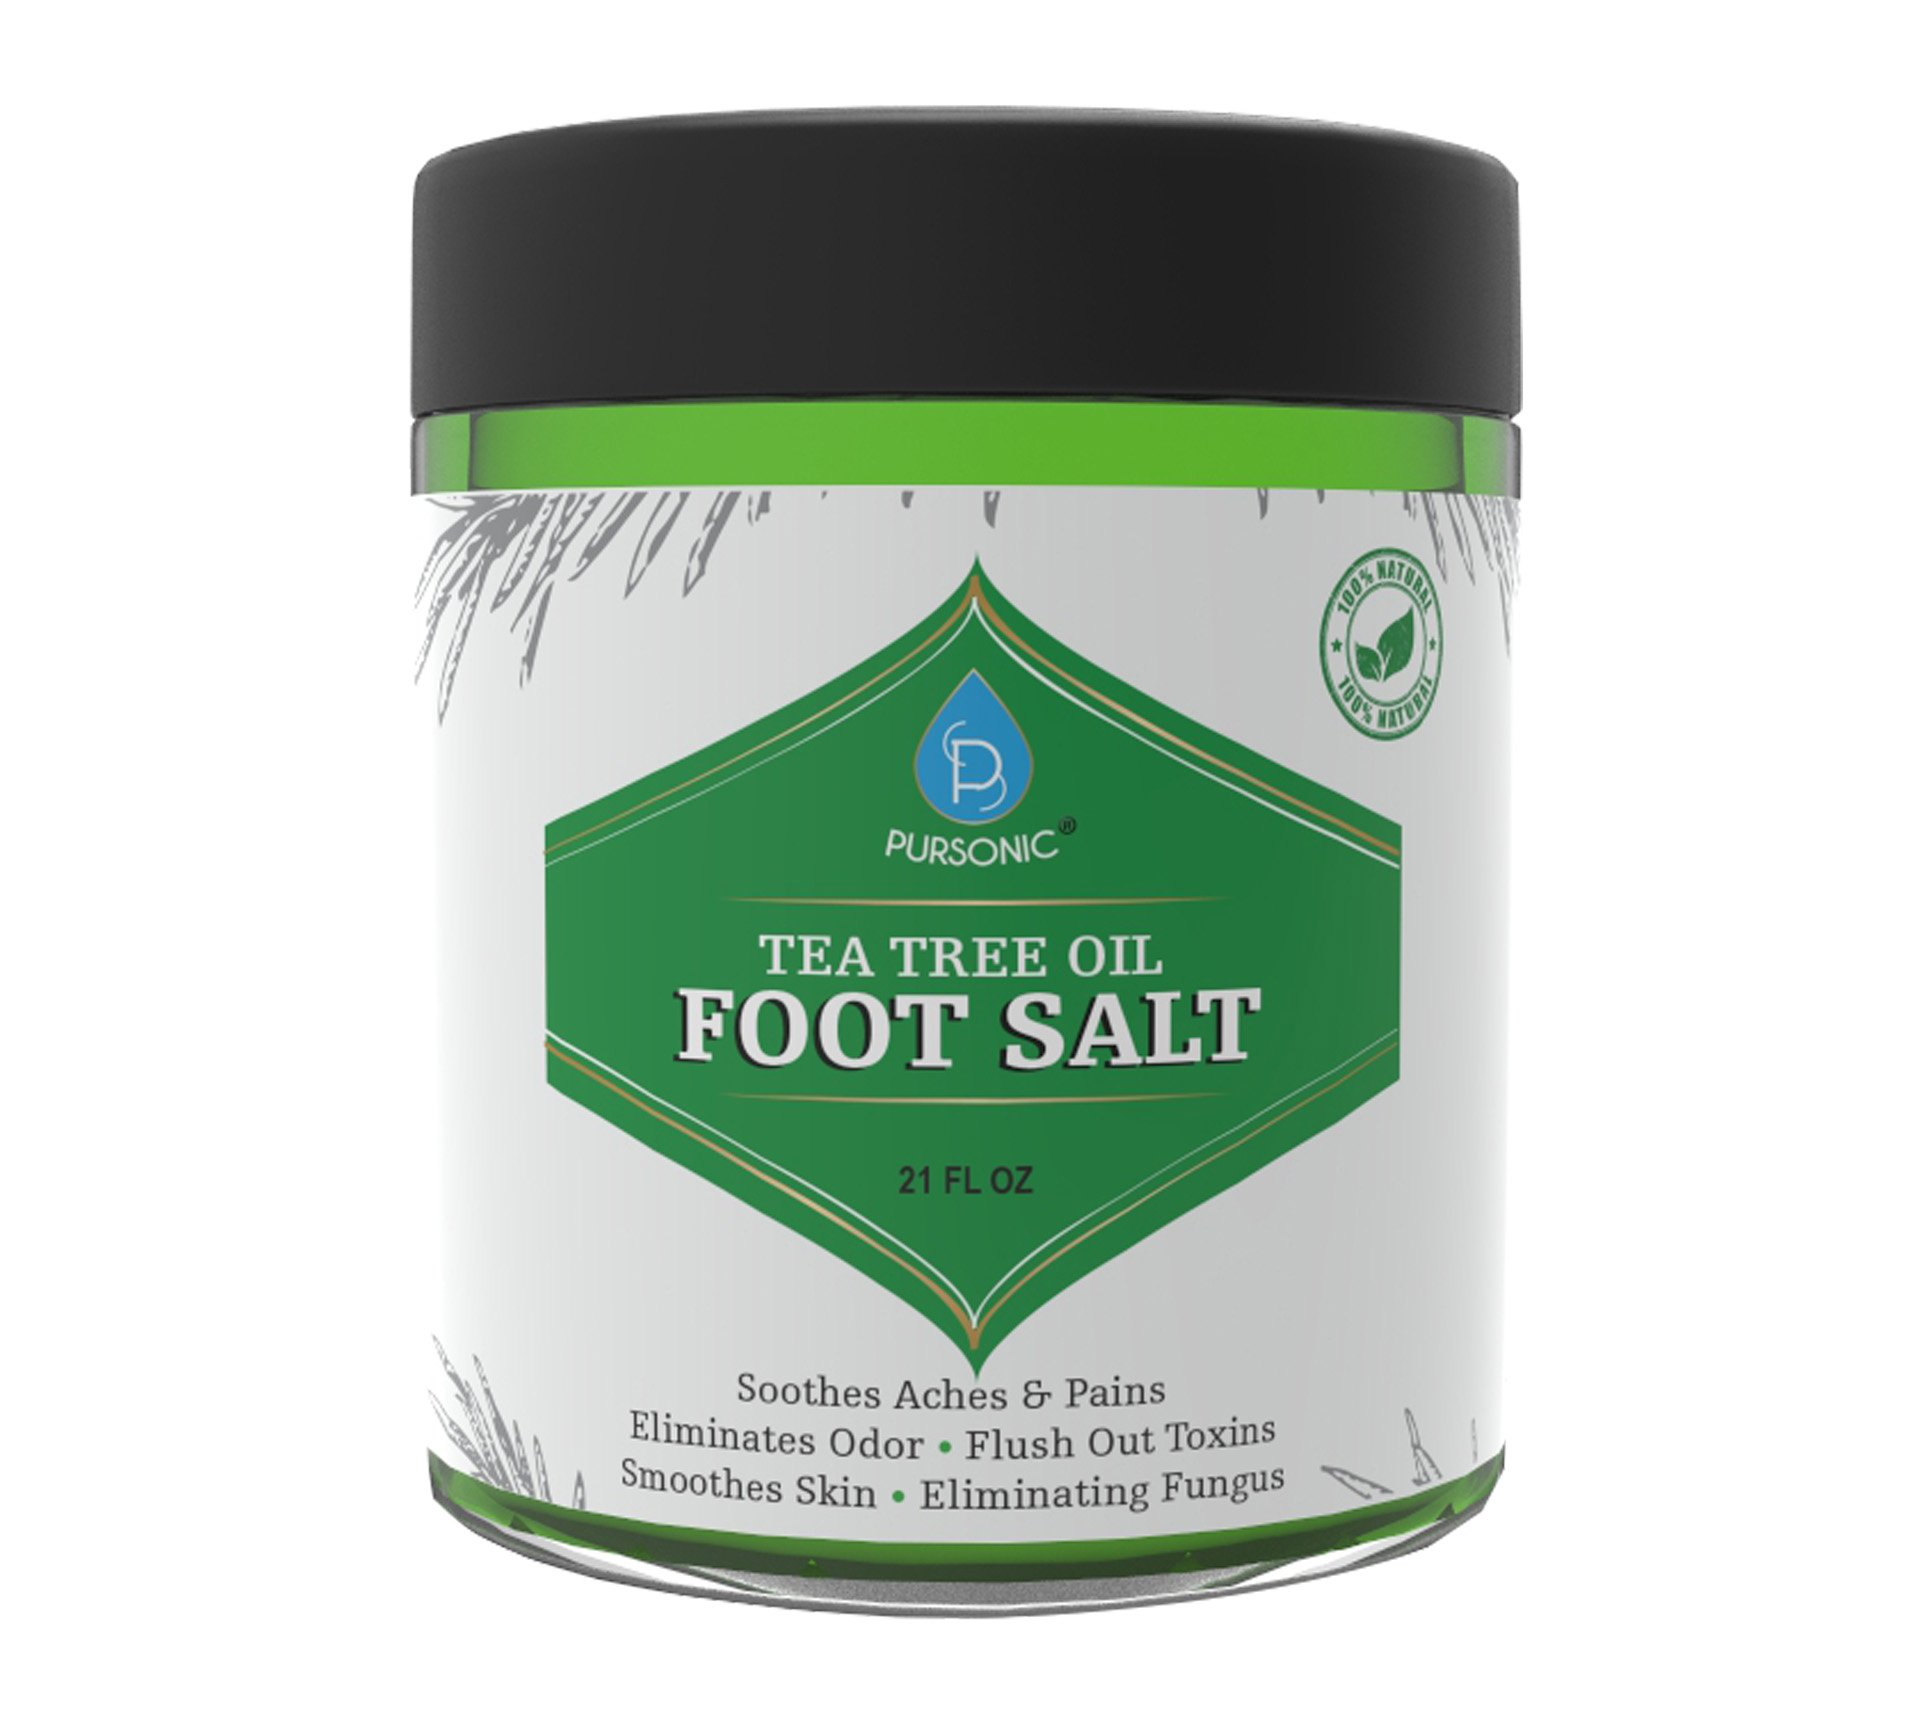 Pursonic Tea Tree Oil Foot Soak With Epsom Salt,Helps Soak Away Toenail Fungus, Athletes Foot & Stubborn Foot Odor - Softens Calluses & Soothes Sore Tired Feet, 21oz by Pursonic